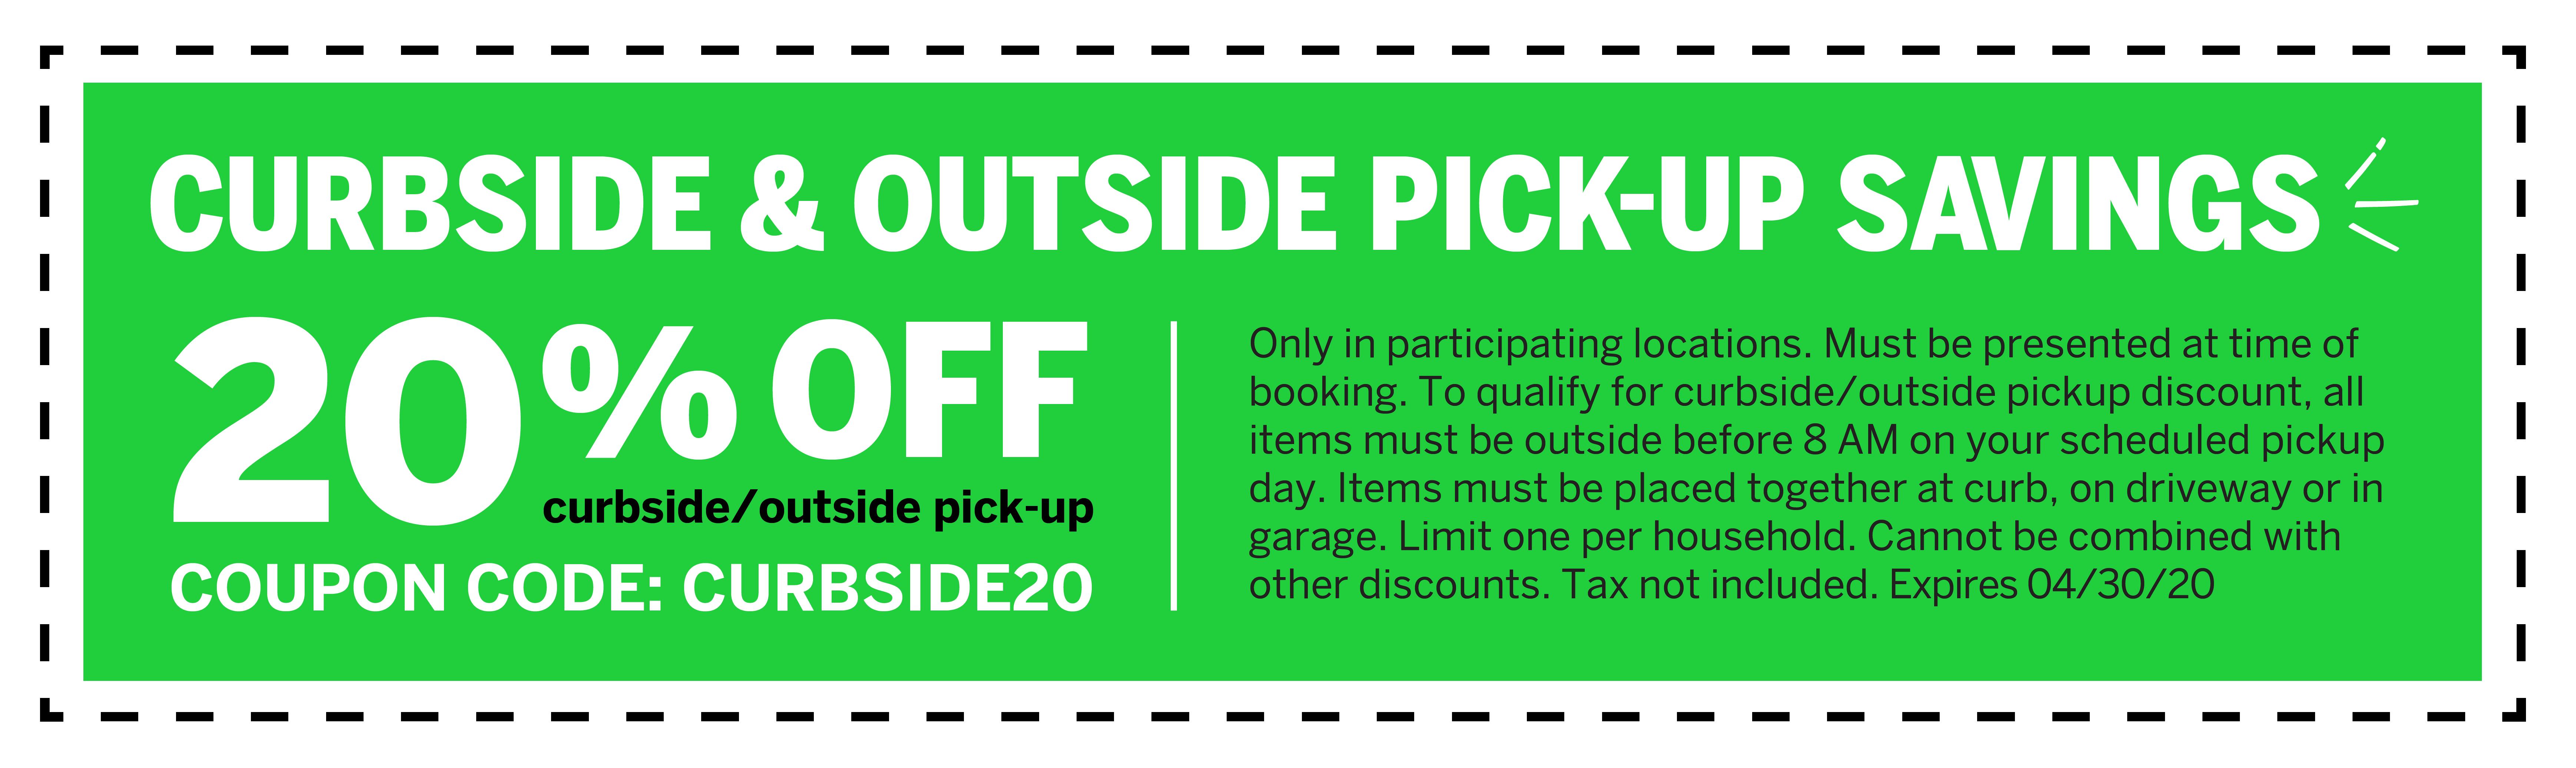 Curbside Pickup Deal